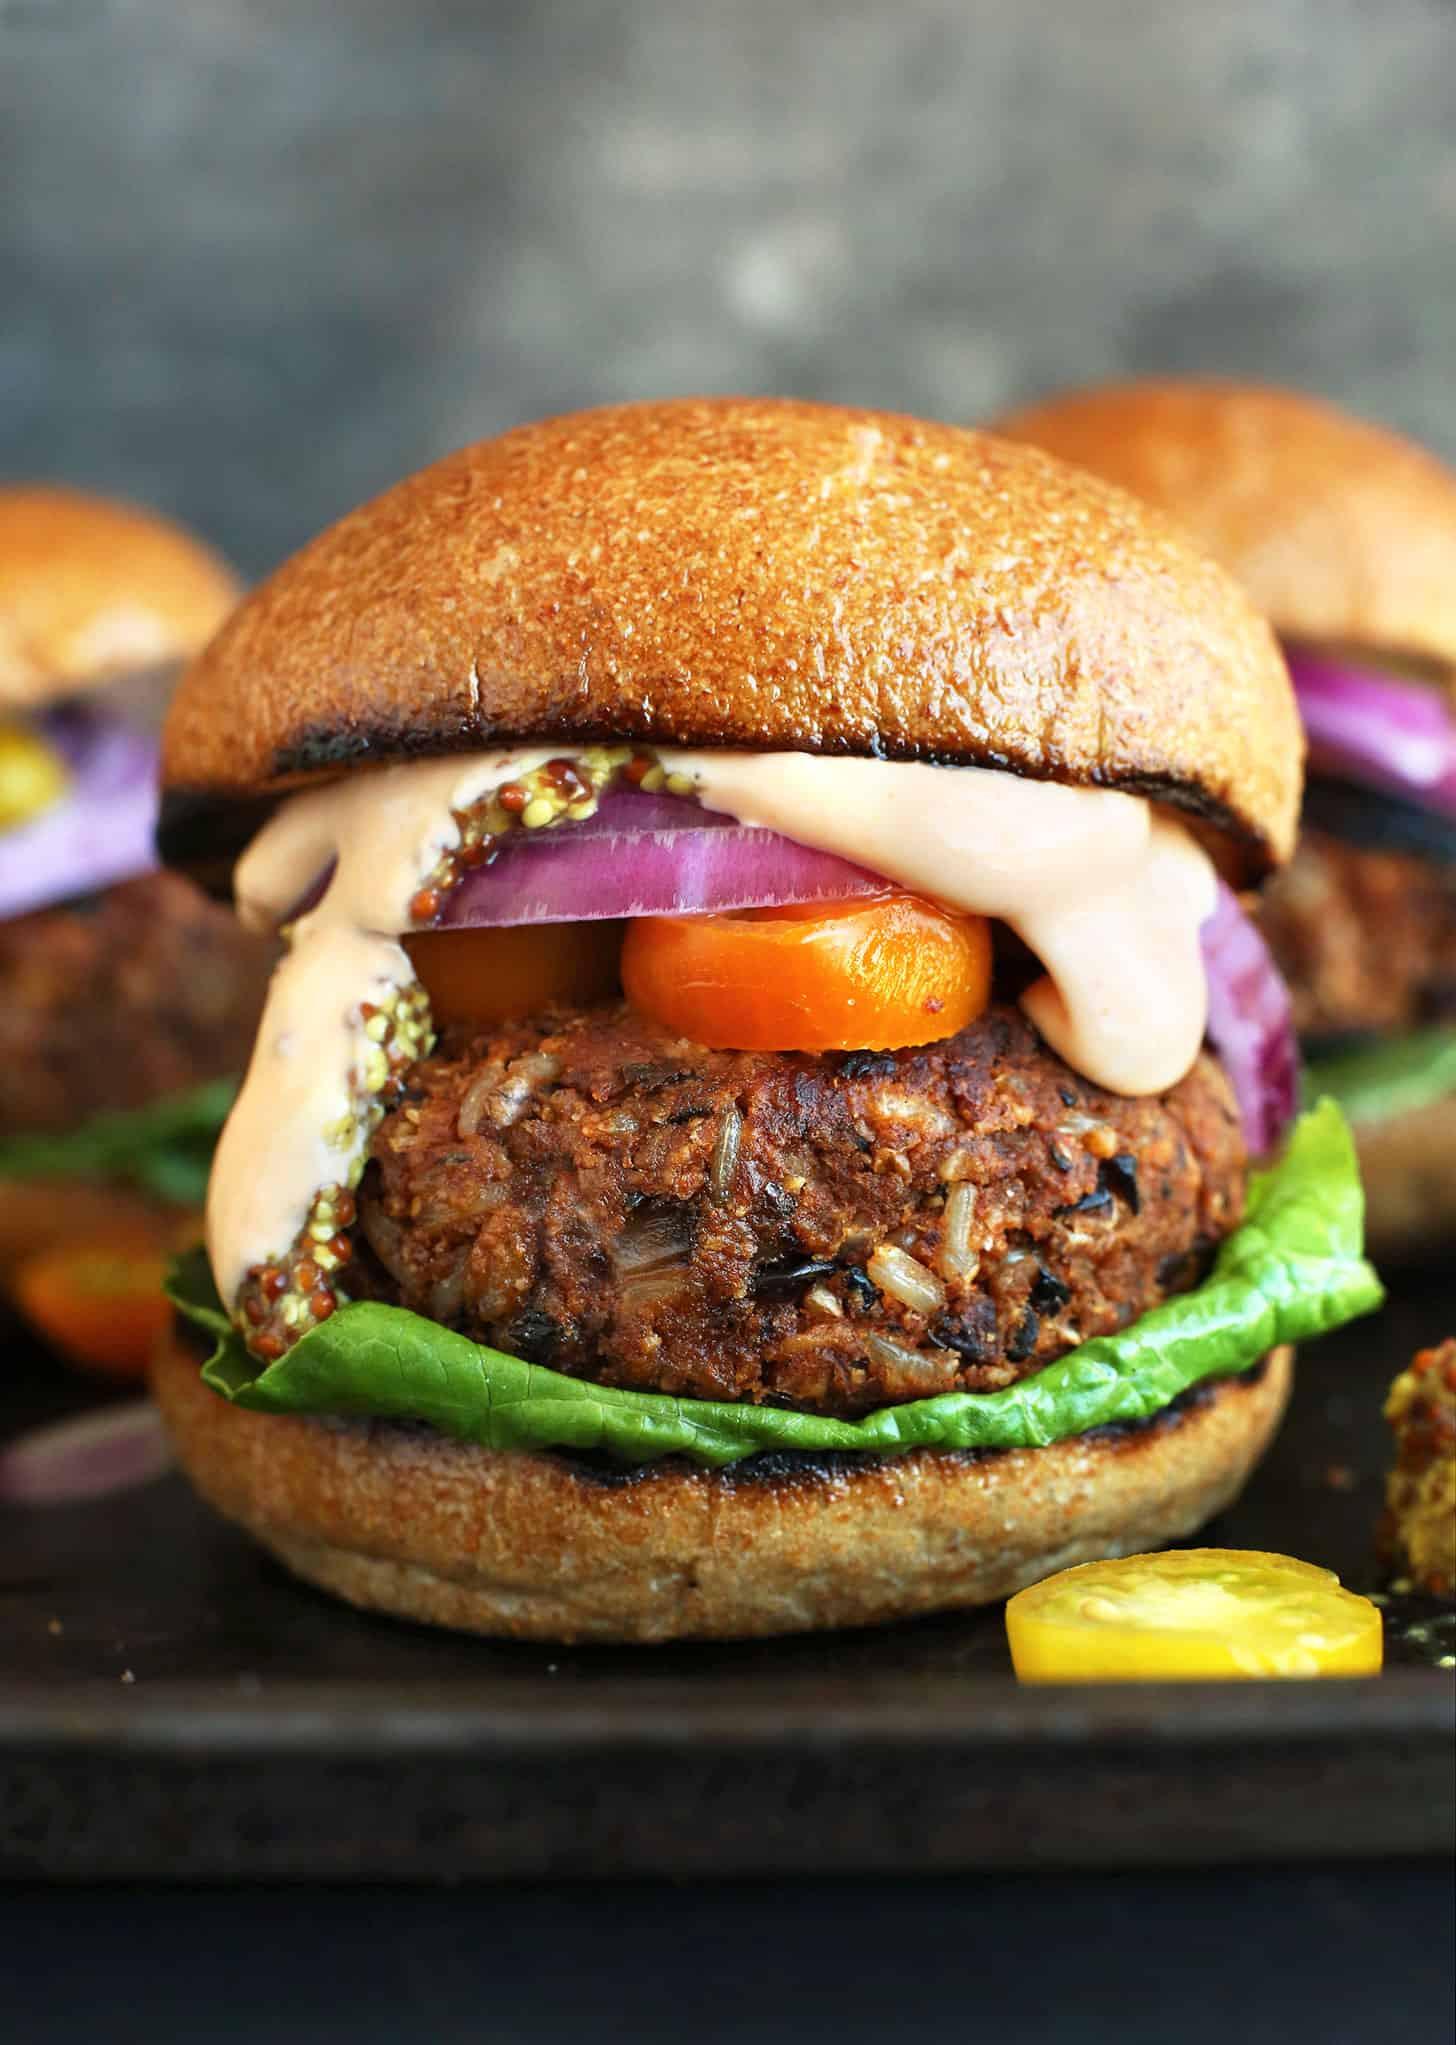 Vegan Burger Recipes  15 Mouth Watering Veggie Burger Recipes